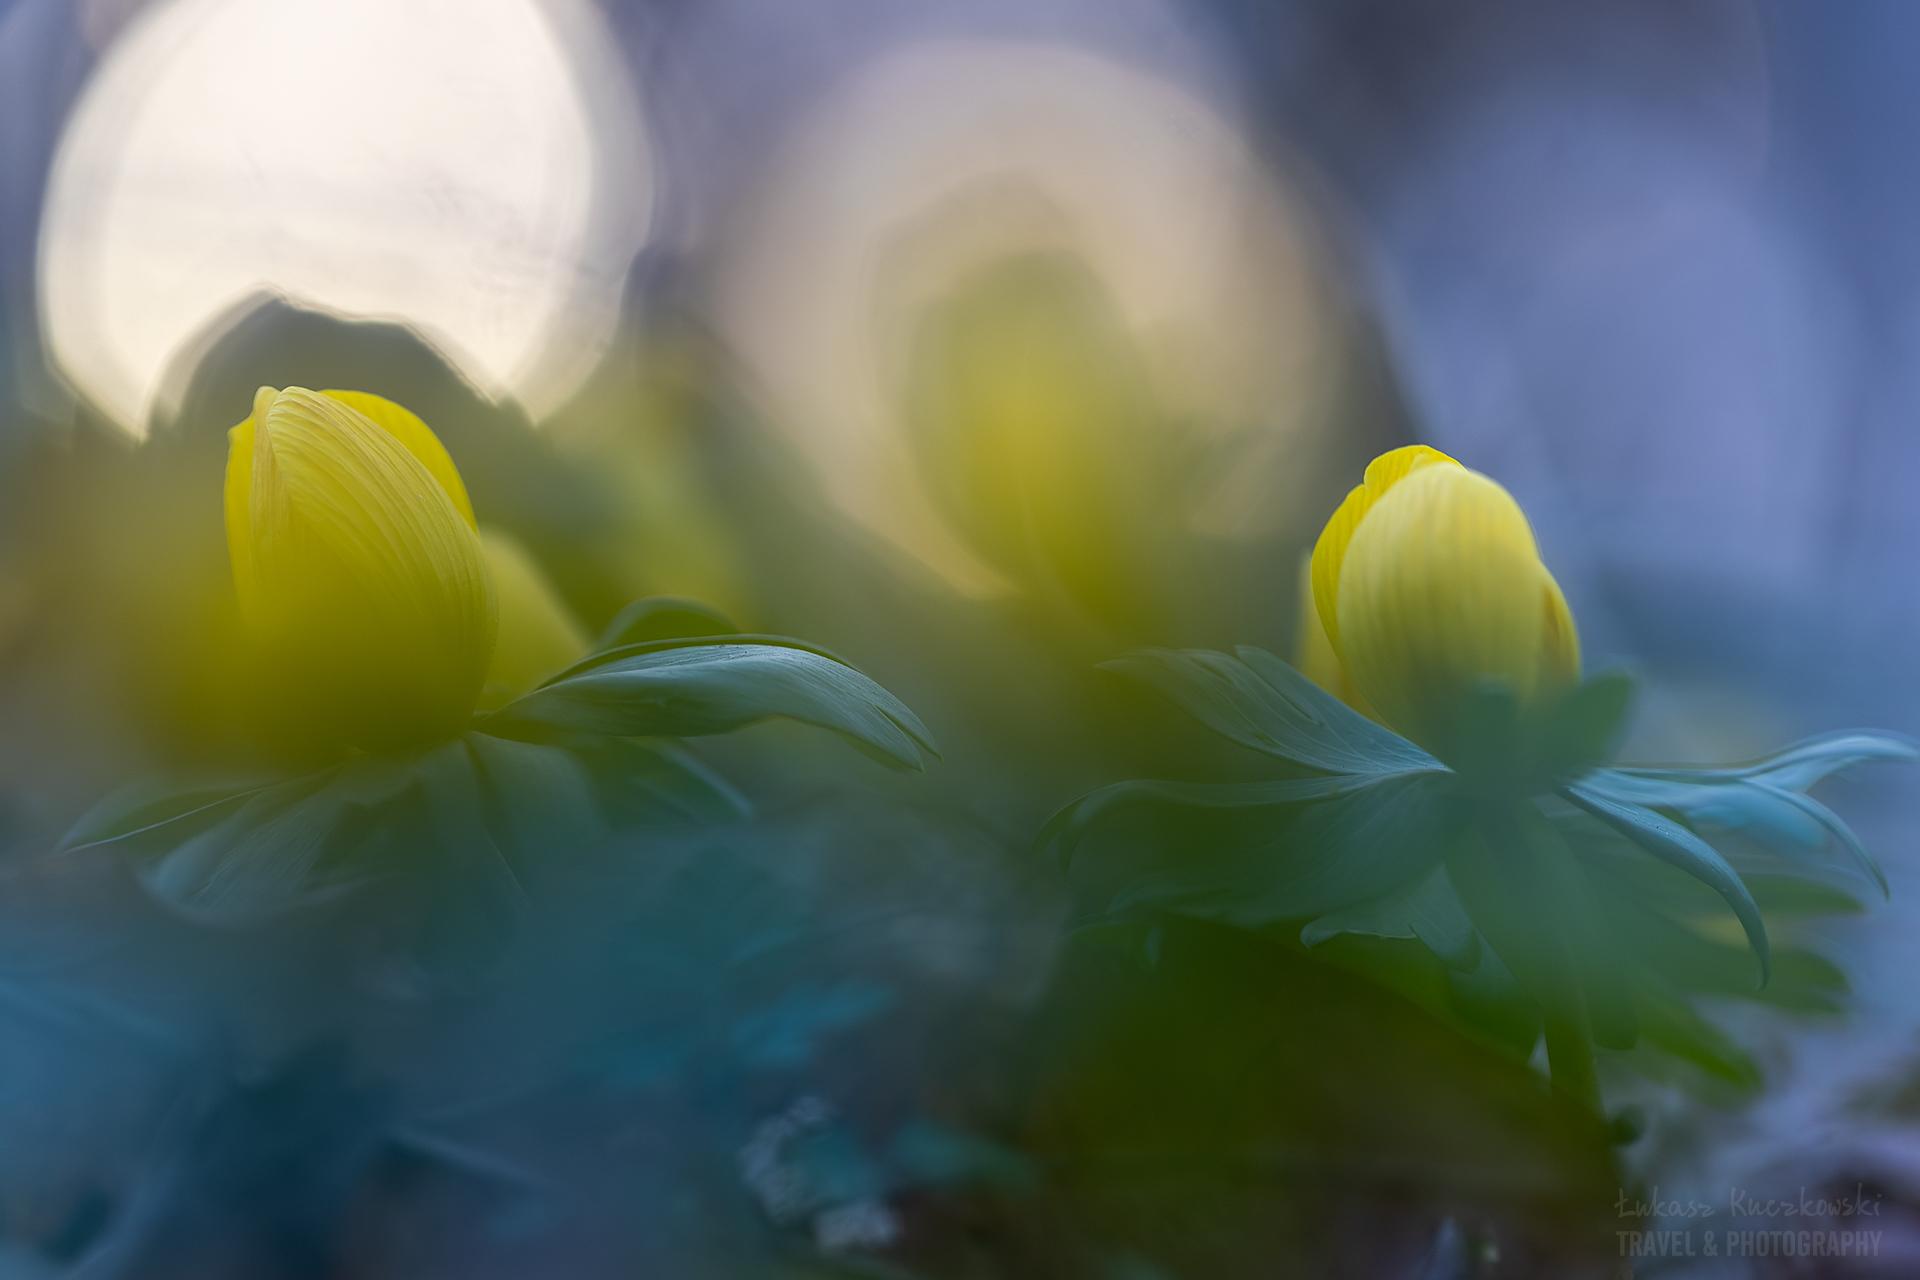 ranniki-wiosna-kwiaty